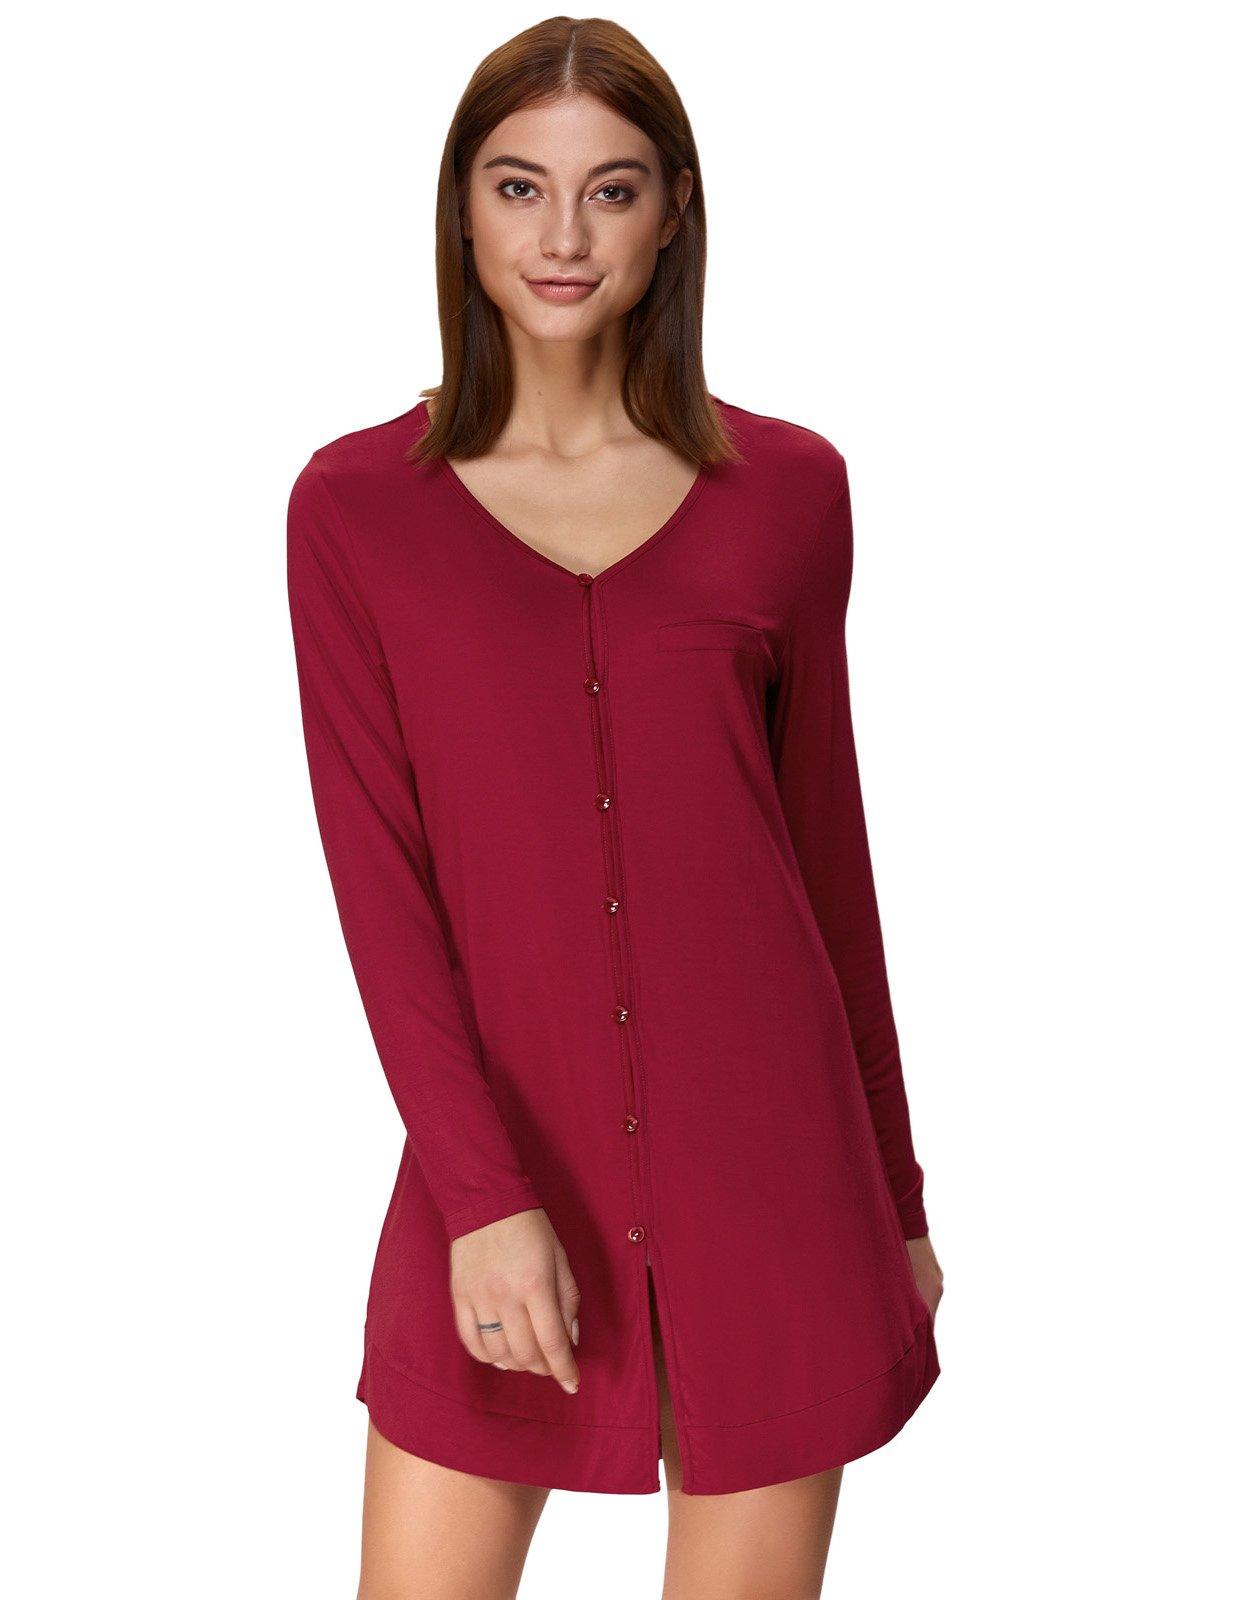 Classy Sleep Shirts for Women Boyfriend Style Sleepwear Wine Red Size M ZE73-3